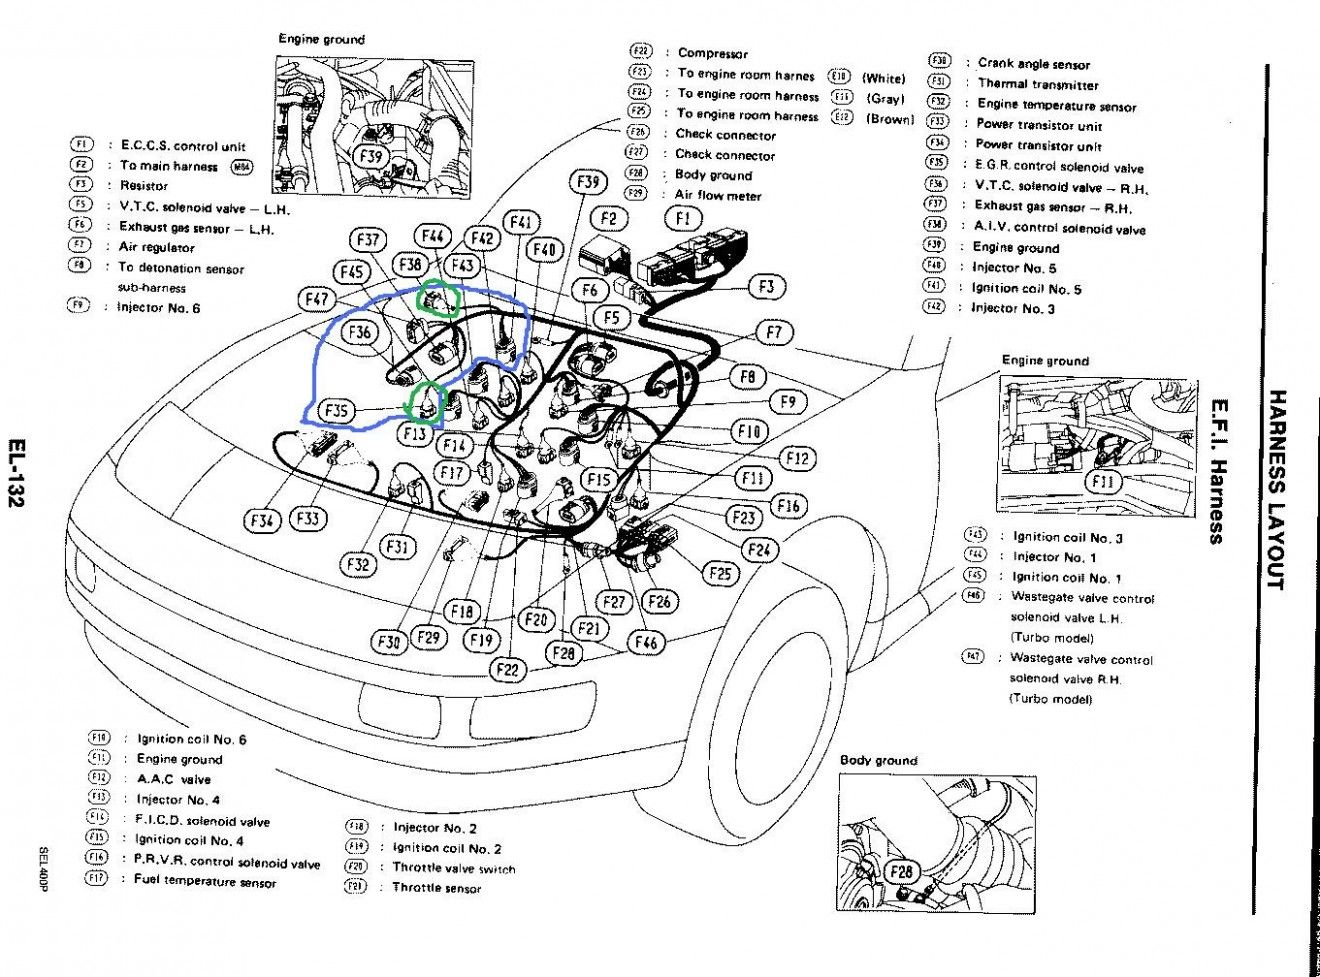 Z4 Engine Diagram Download Z4 Engine Diagram Download